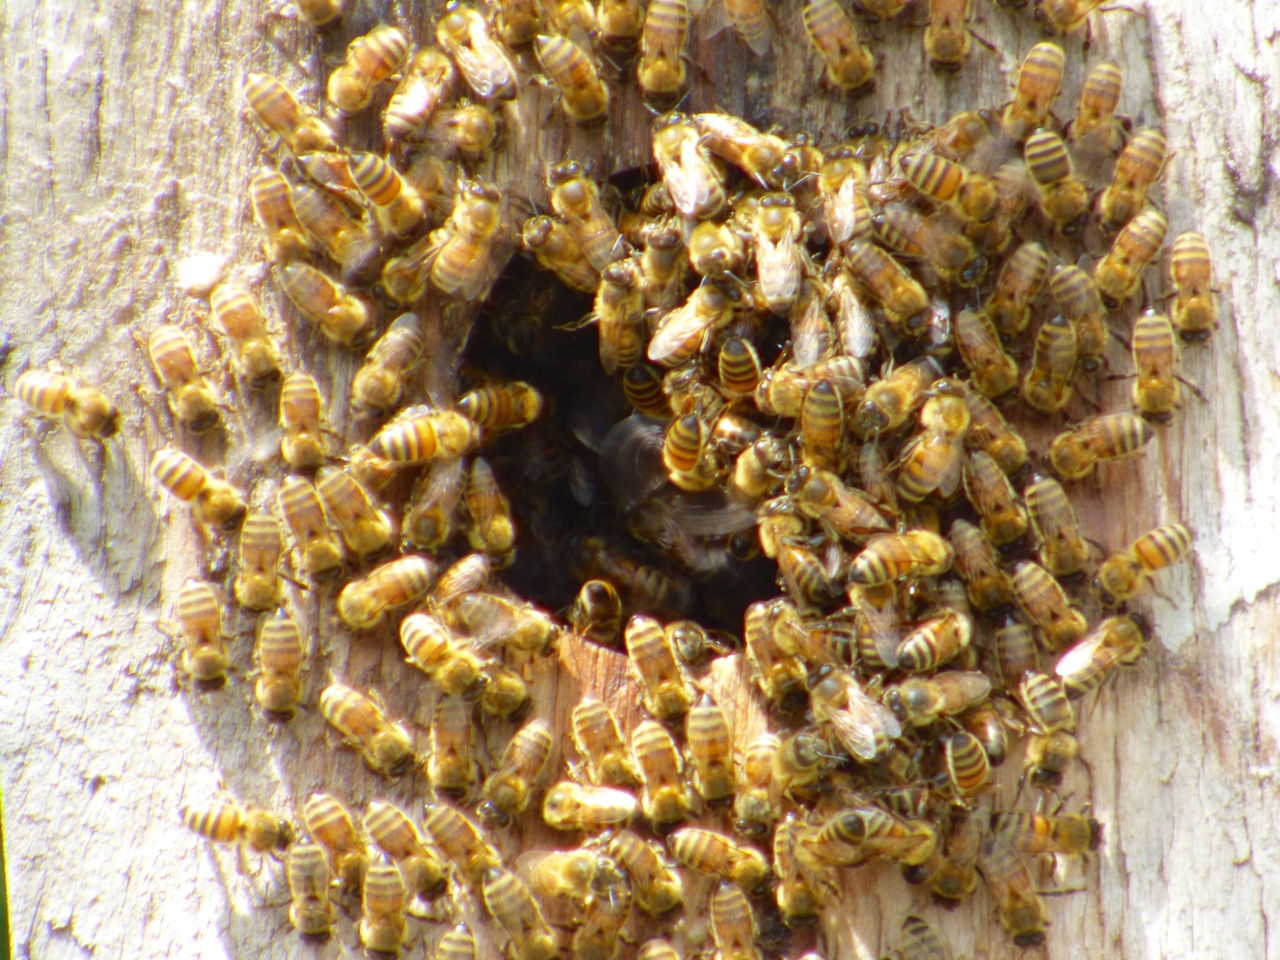 Bees at Delphi Abaco 2